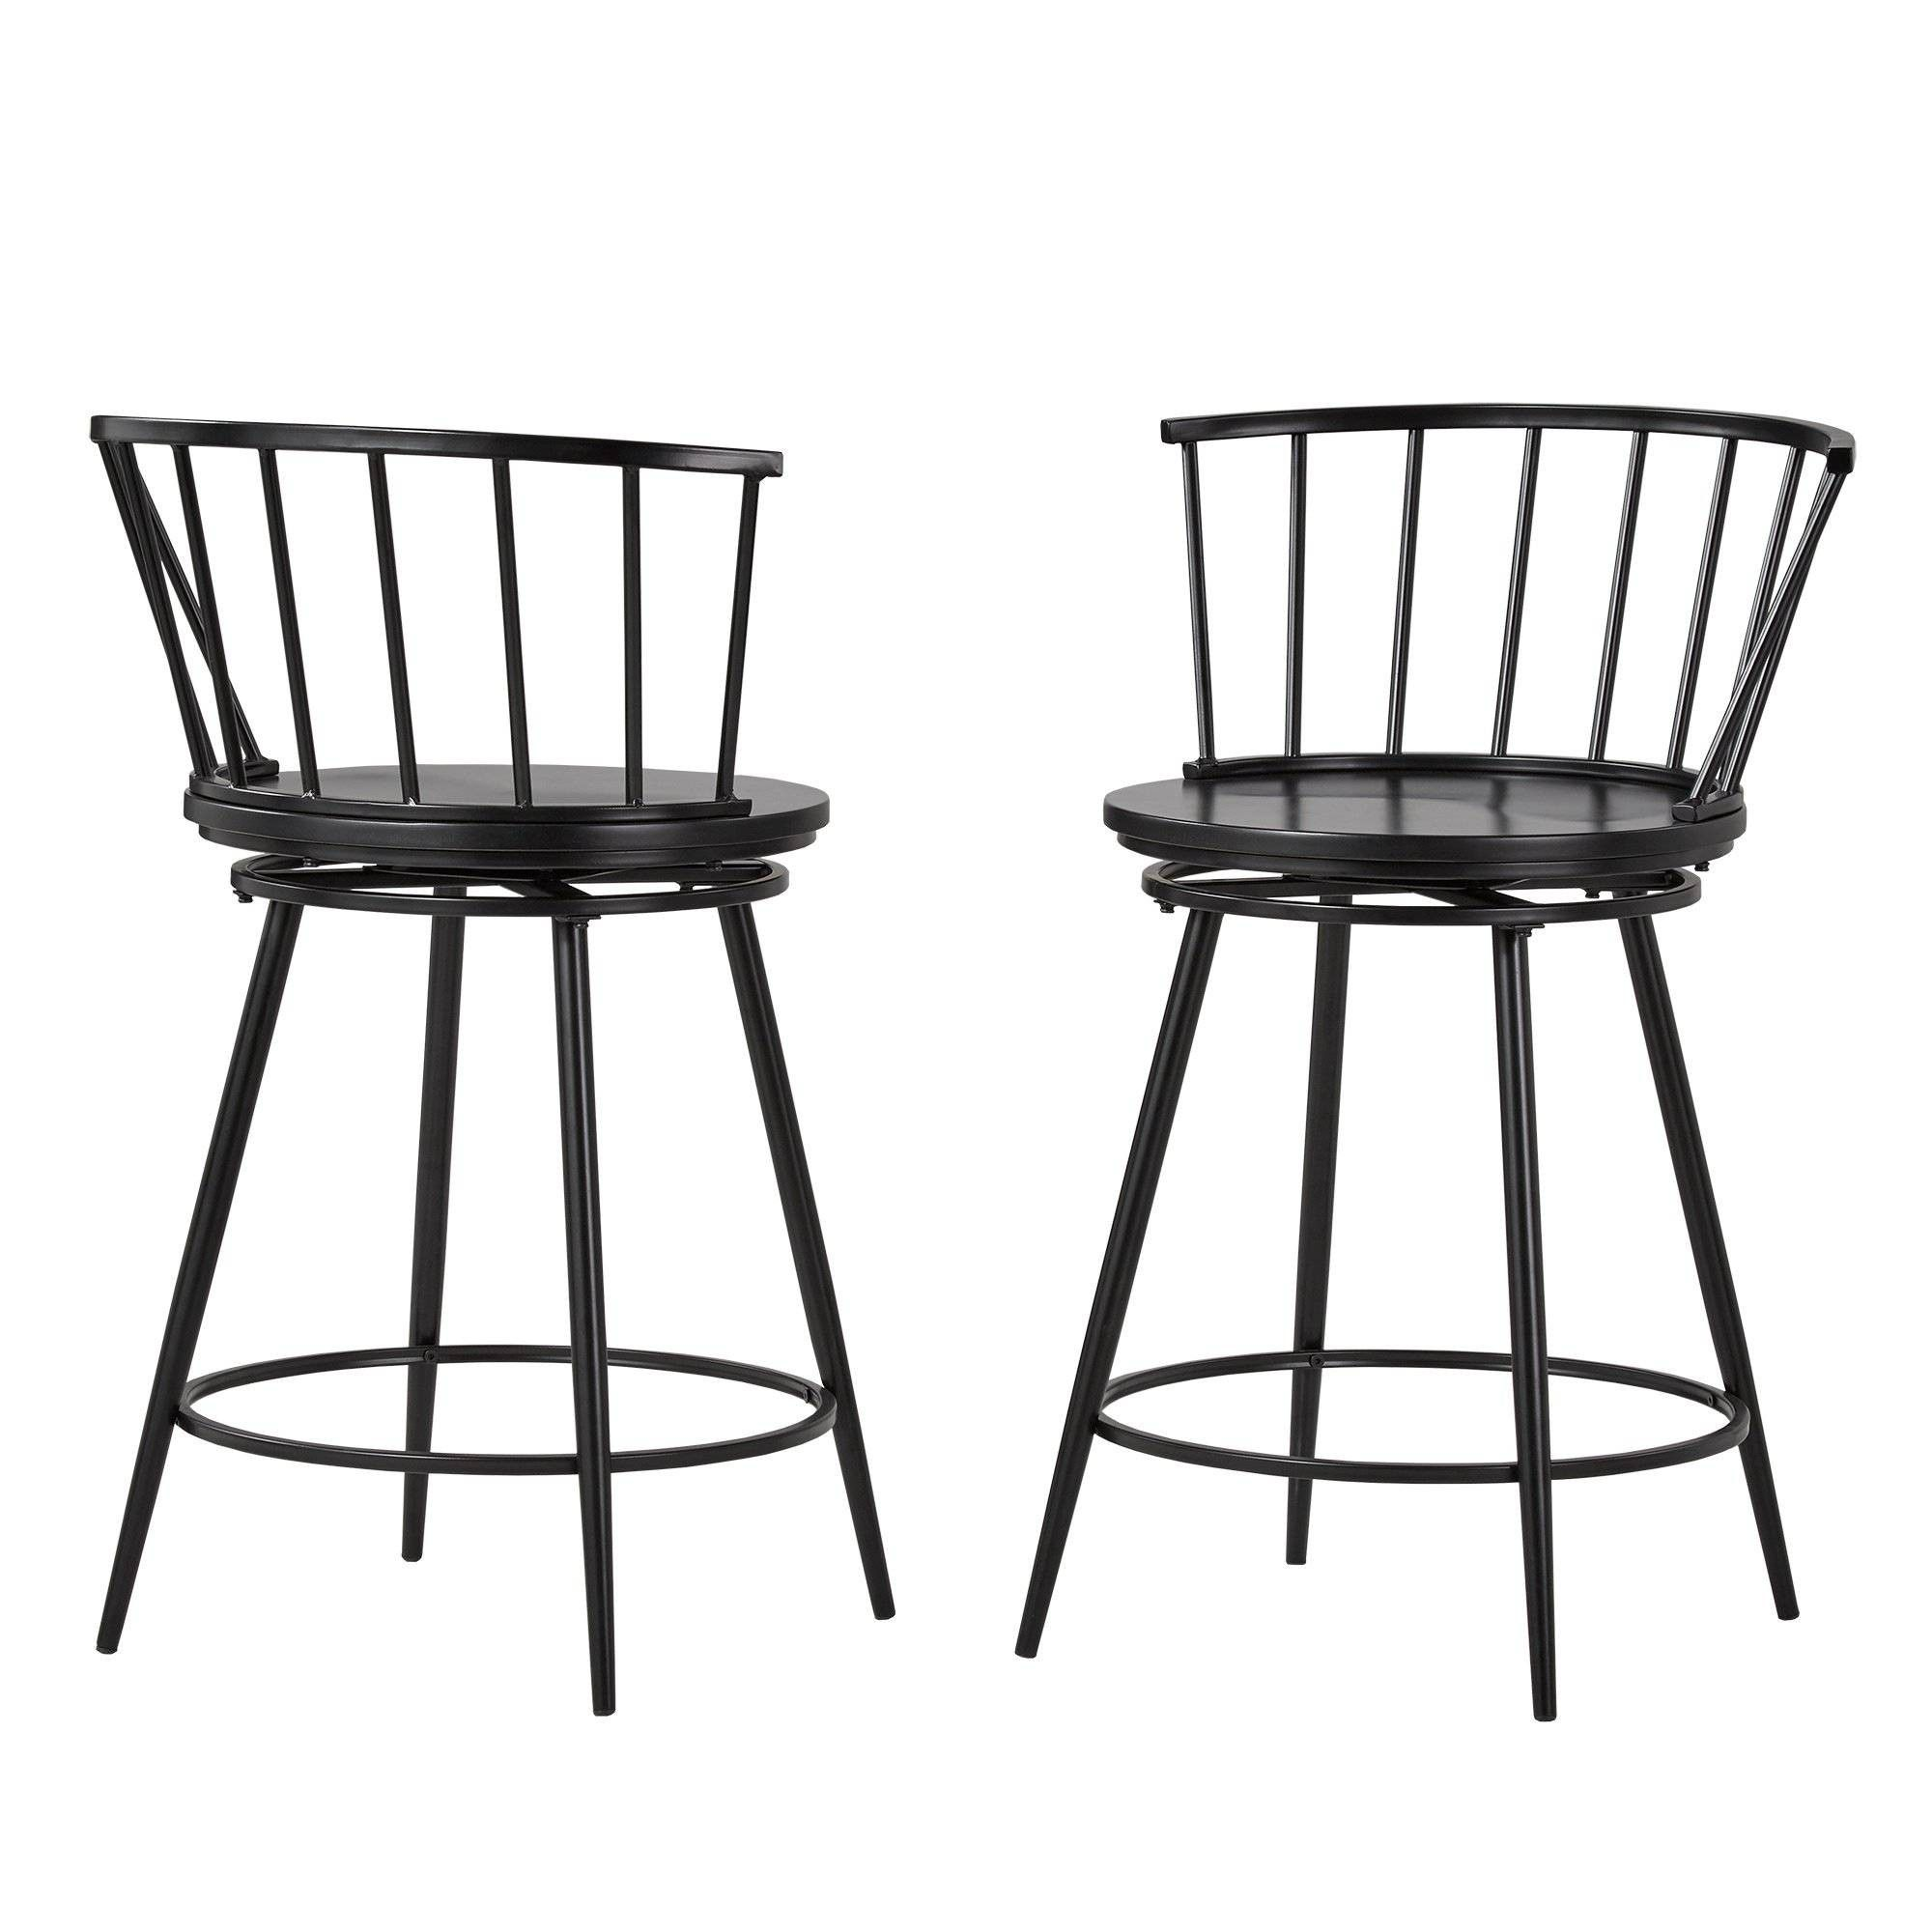 Wondrous 24 Set Of 2 Norfolk Low Windsor Counter Stool Black Machost Co Dining Chair Design Ideas Machostcouk